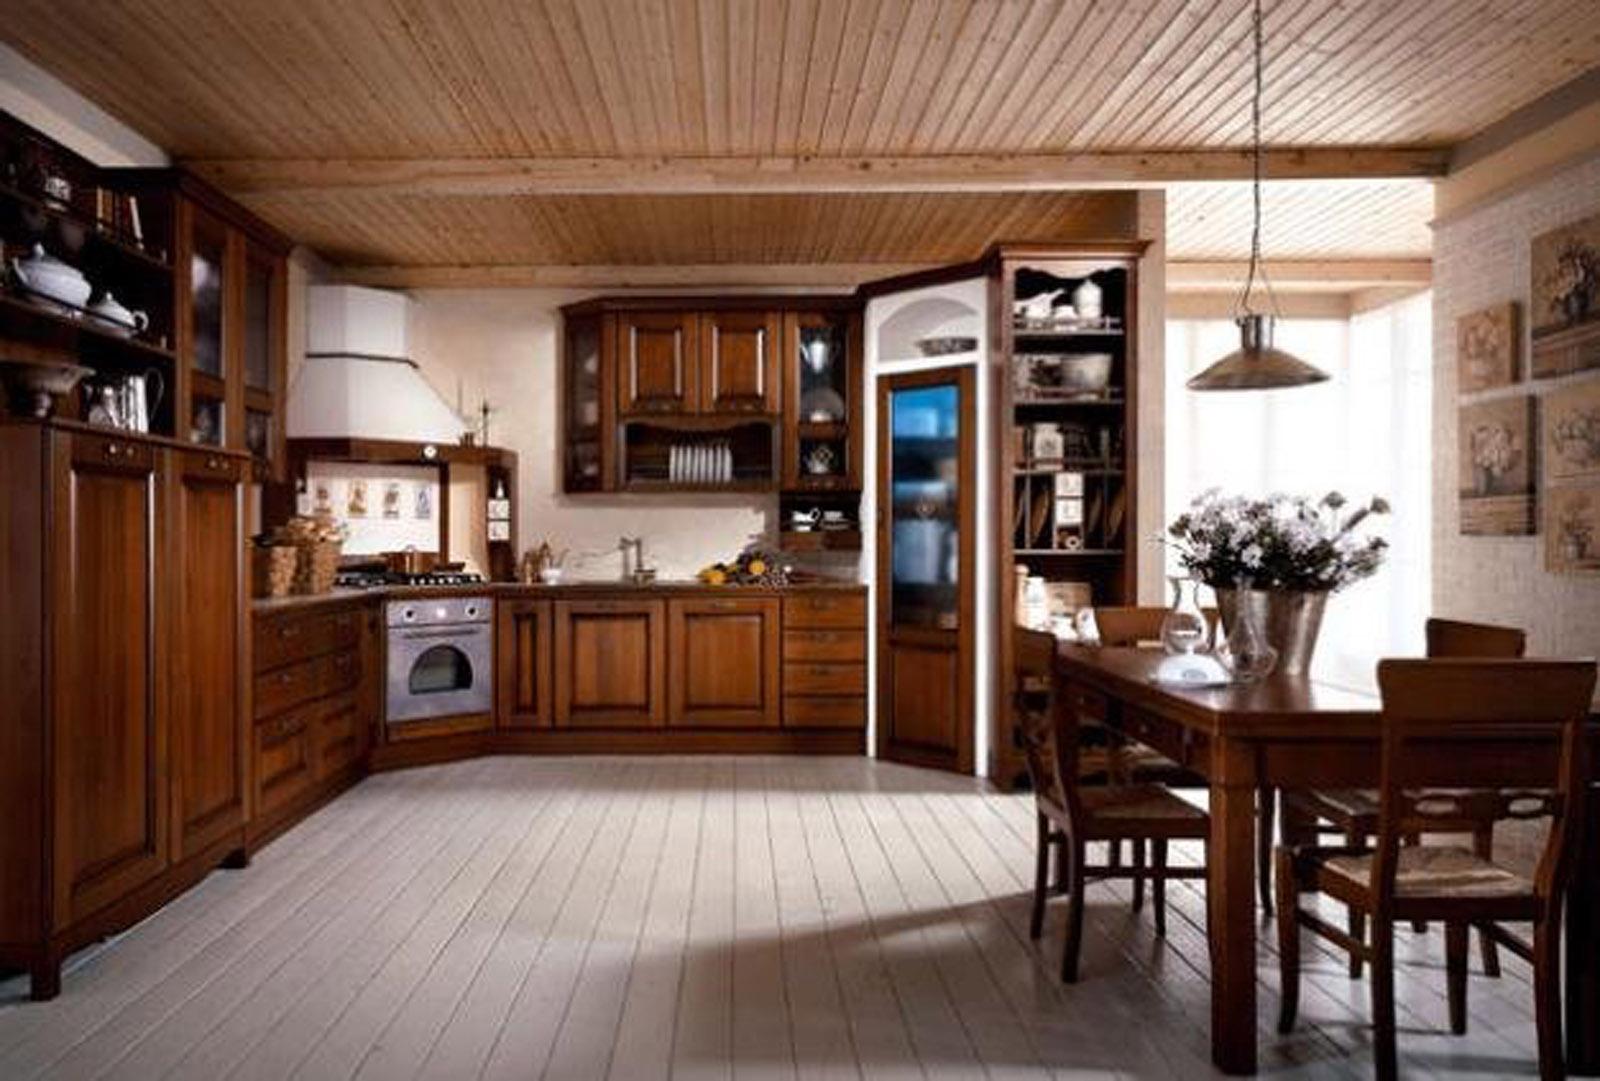 Emejing Cucine Componibili Catania Gallery - Home Design Ideas ...